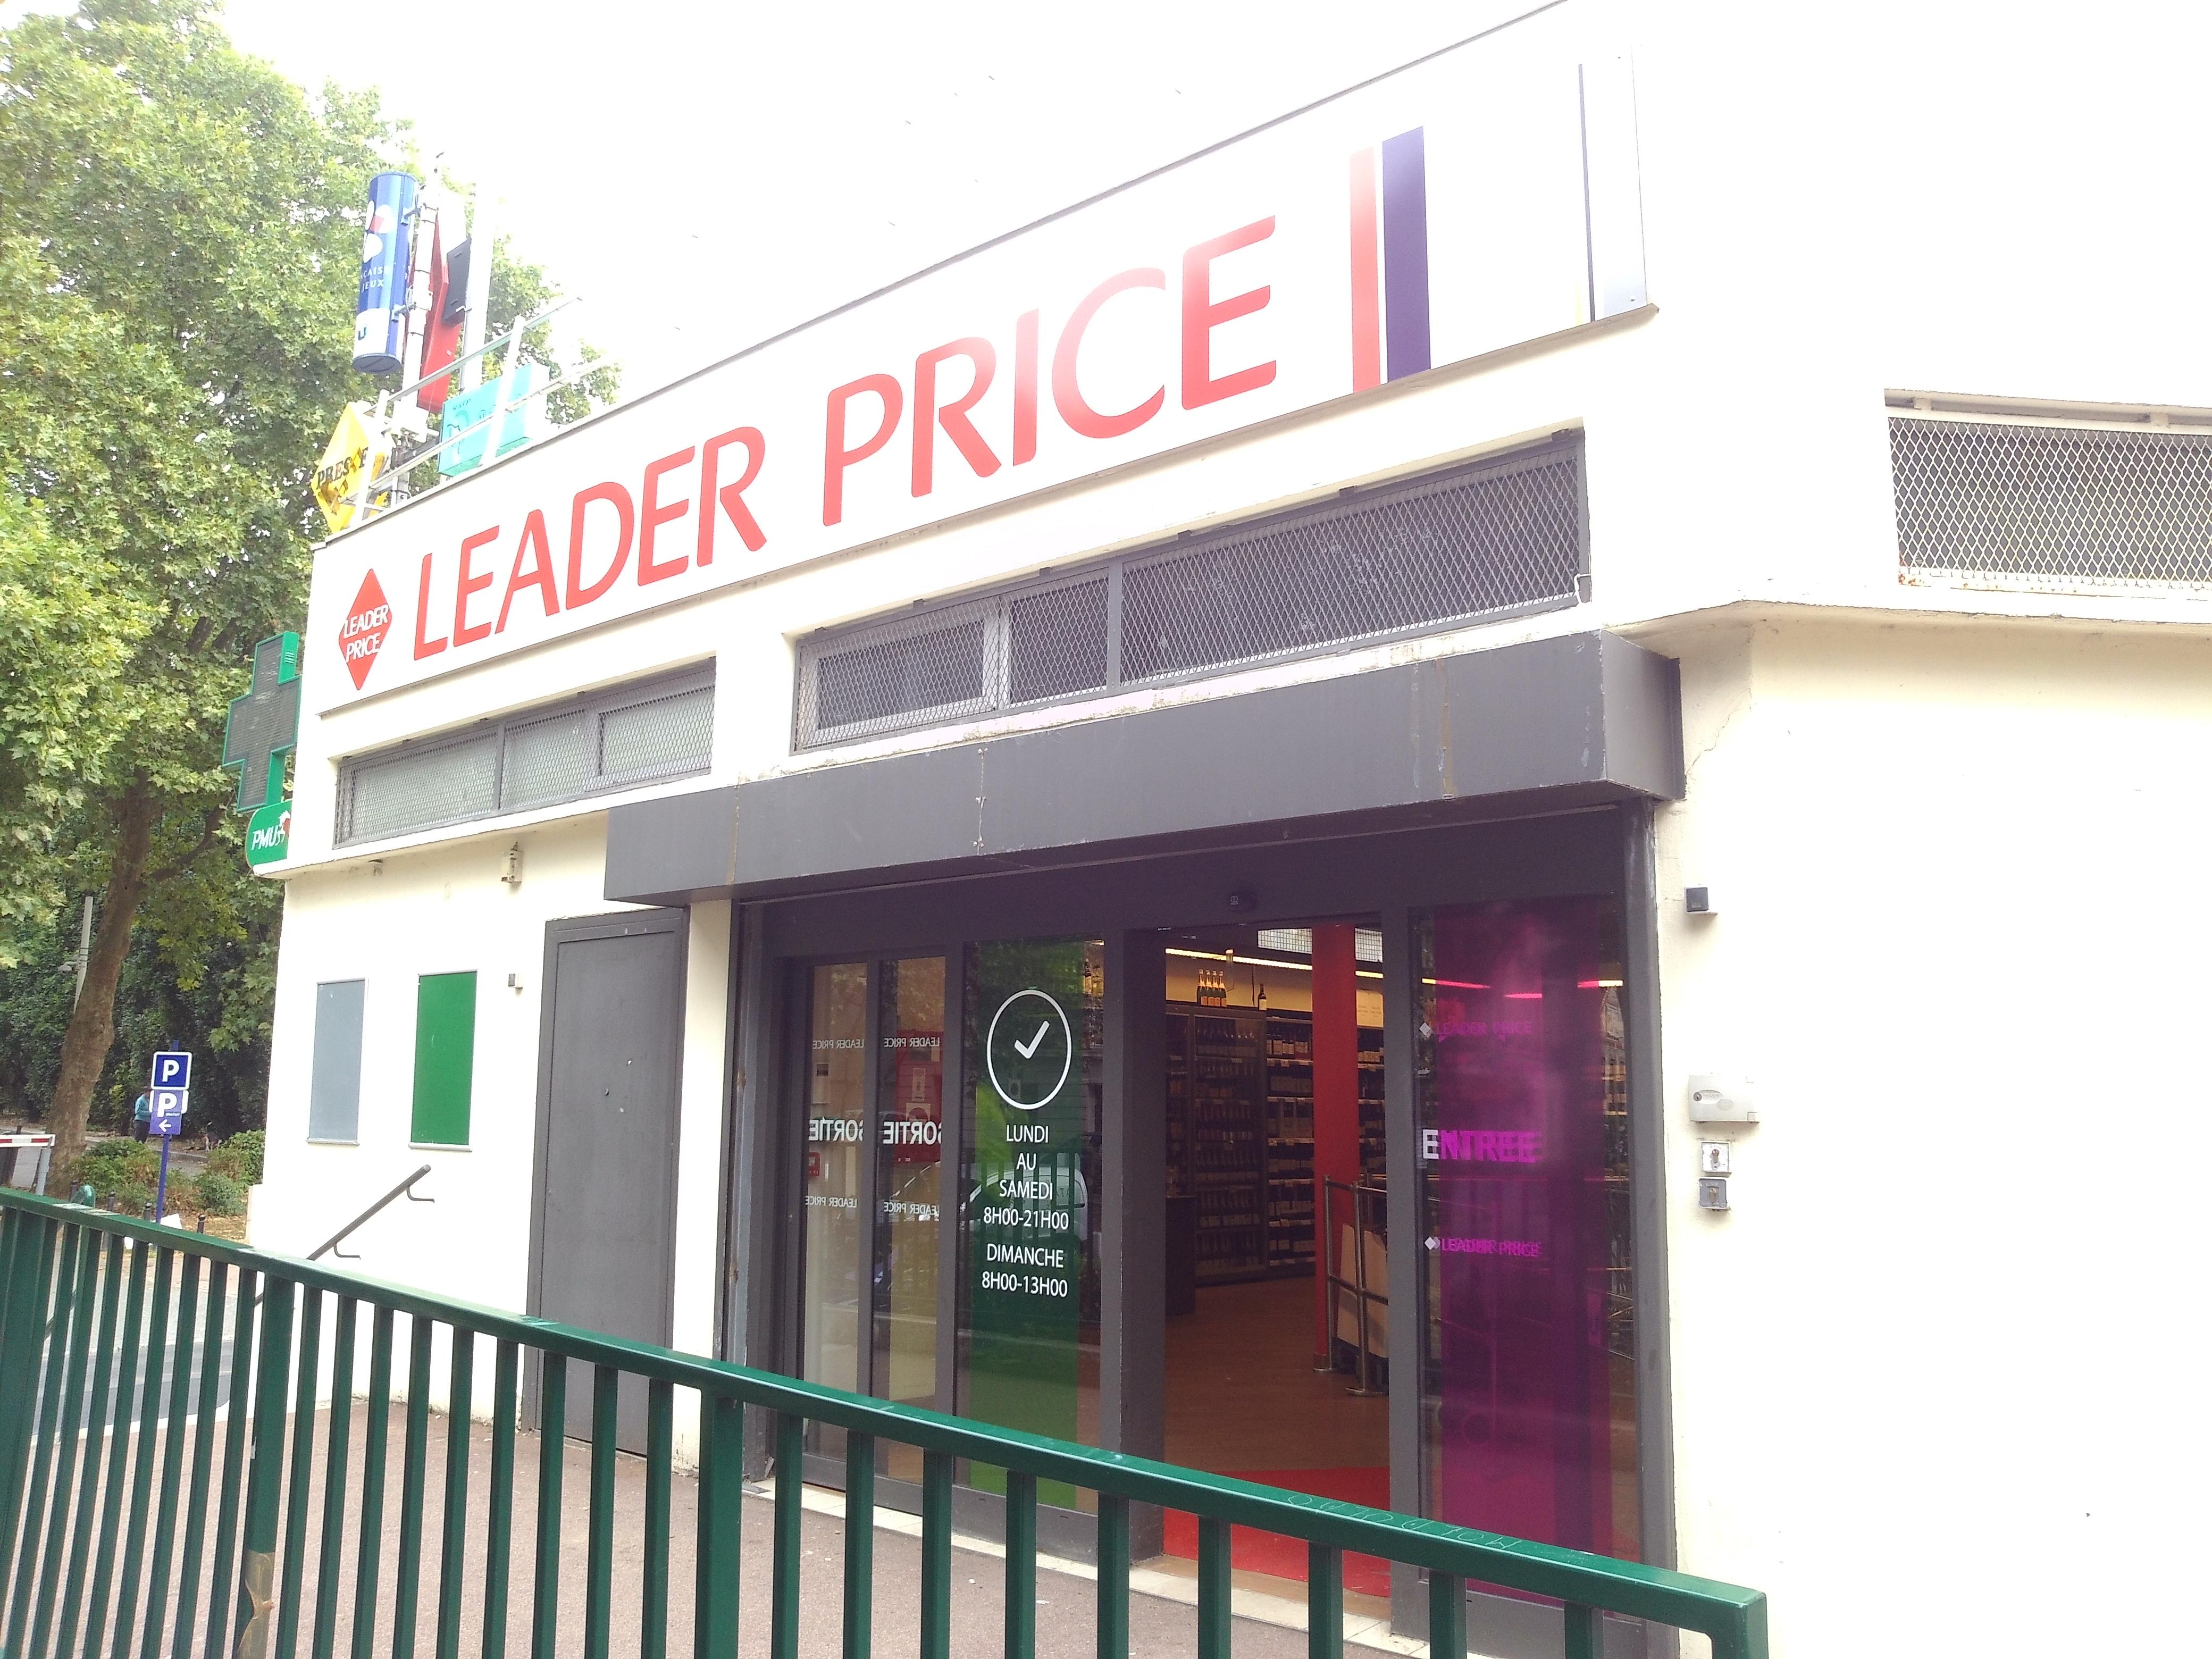 gentilly accueille un nouveau leader price 94 citoyens. Black Bedroom Furniture Sets. Home Design Ideas